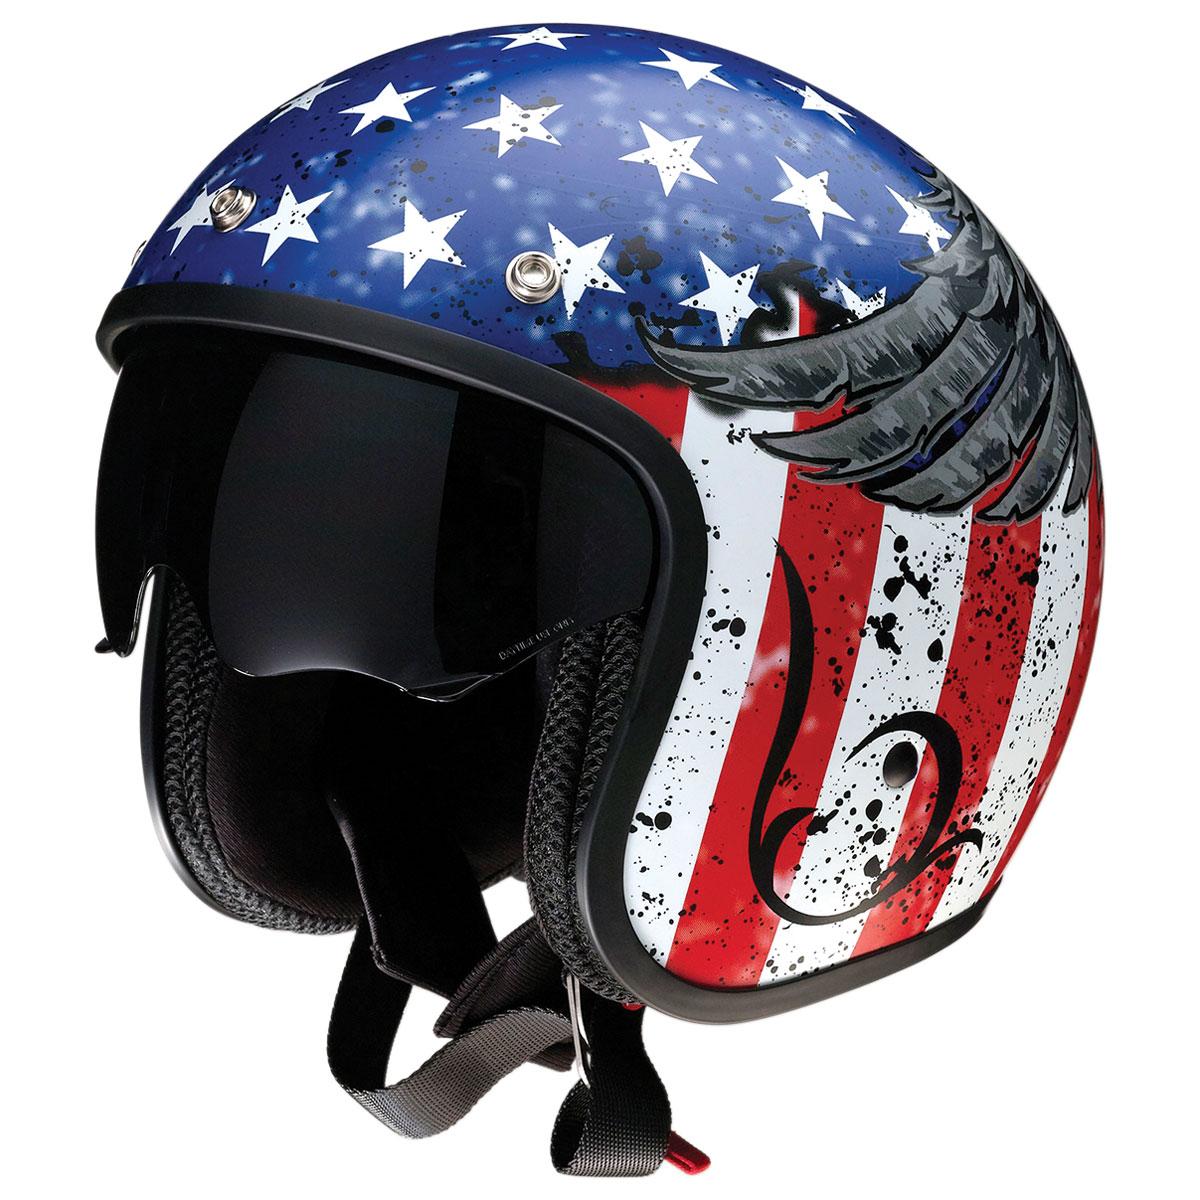 Z1R Saturn Justice Open Face Helmet